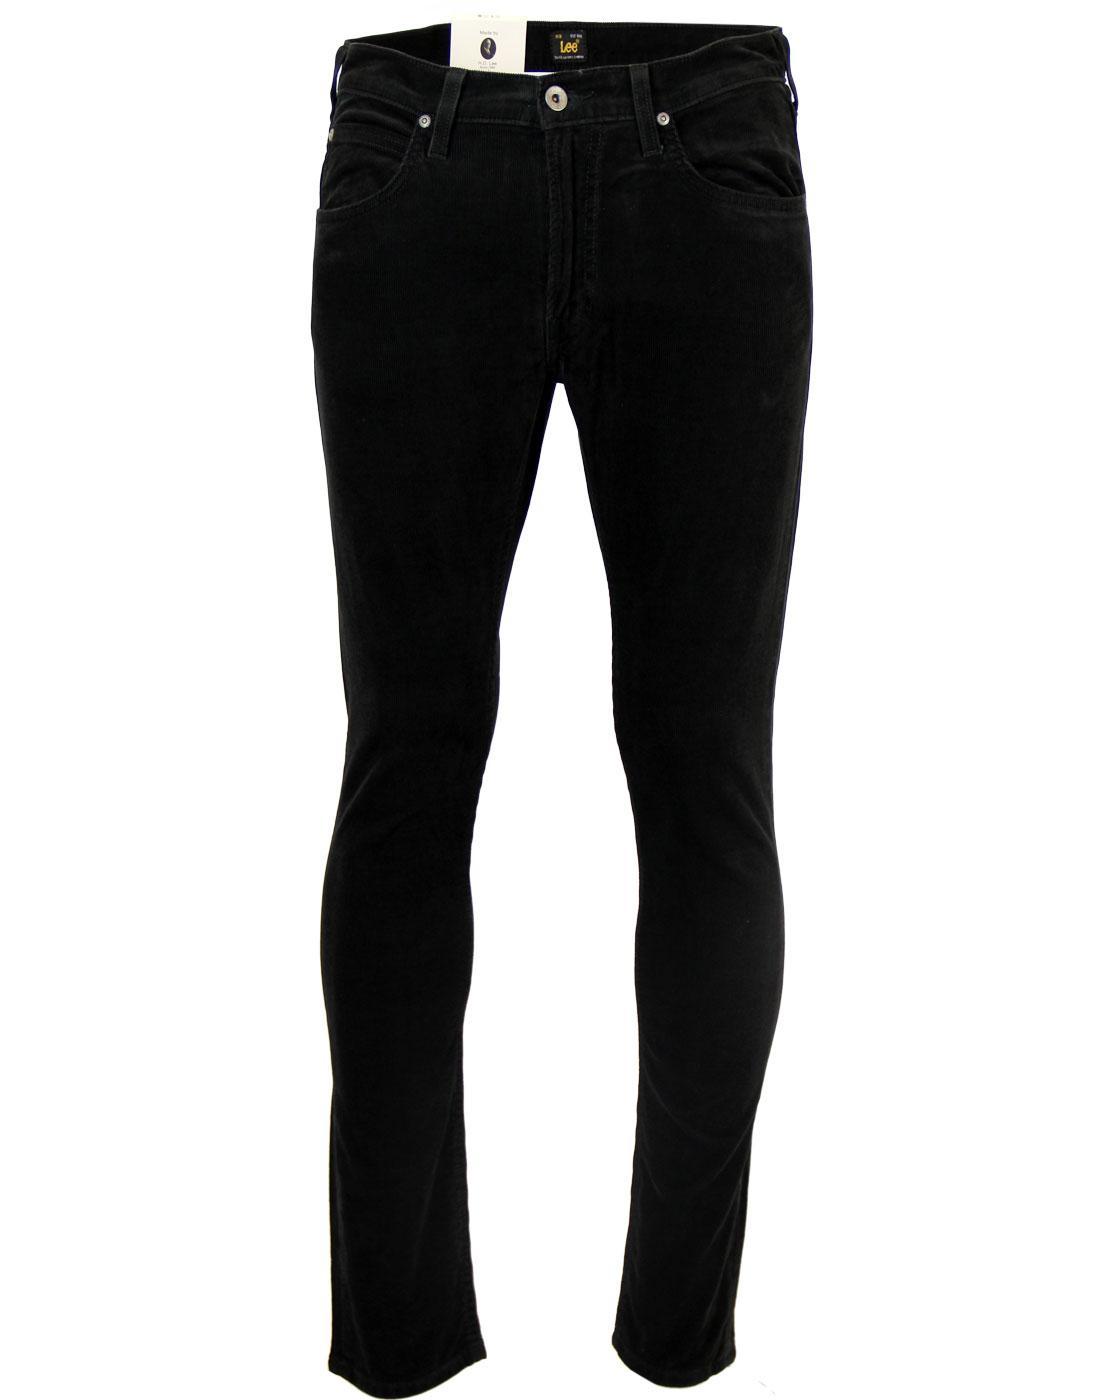 Luke LEE Retro Mod Slim Tapered Cord Jeans (BLACK)